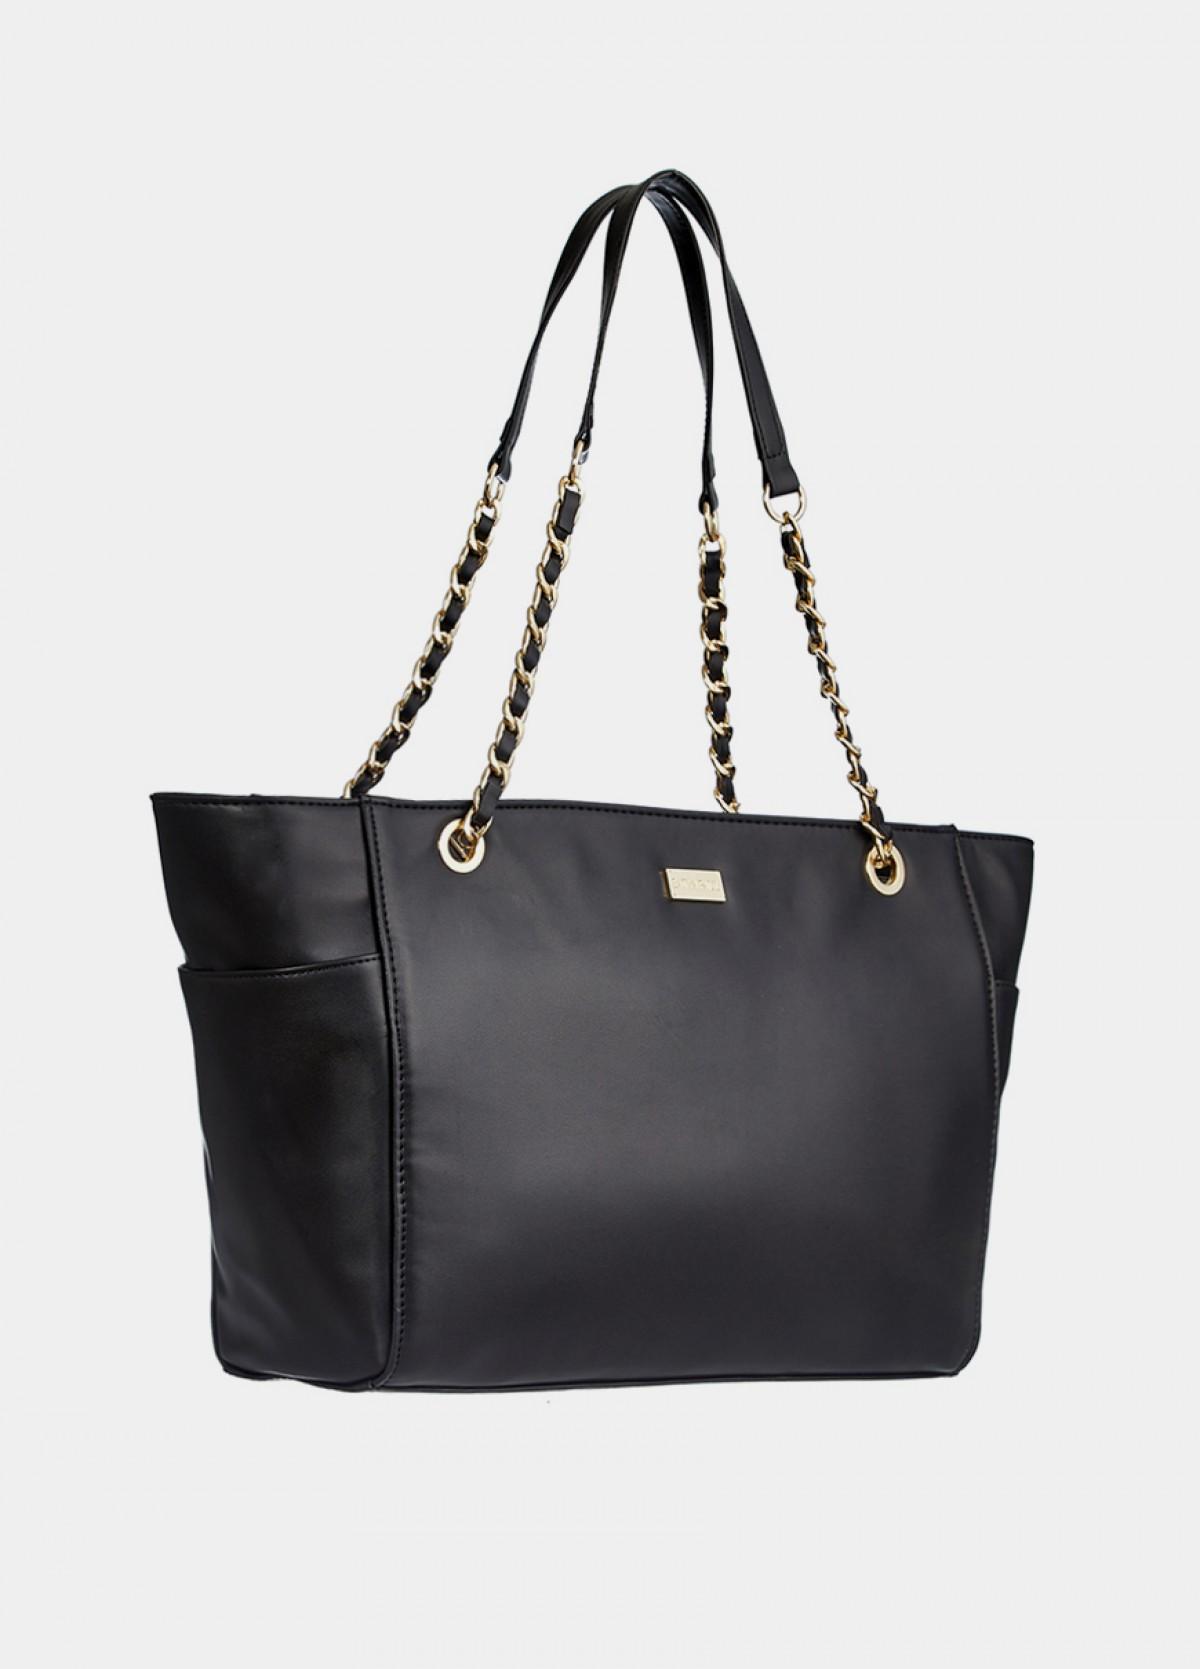 The Black Shopper Bag